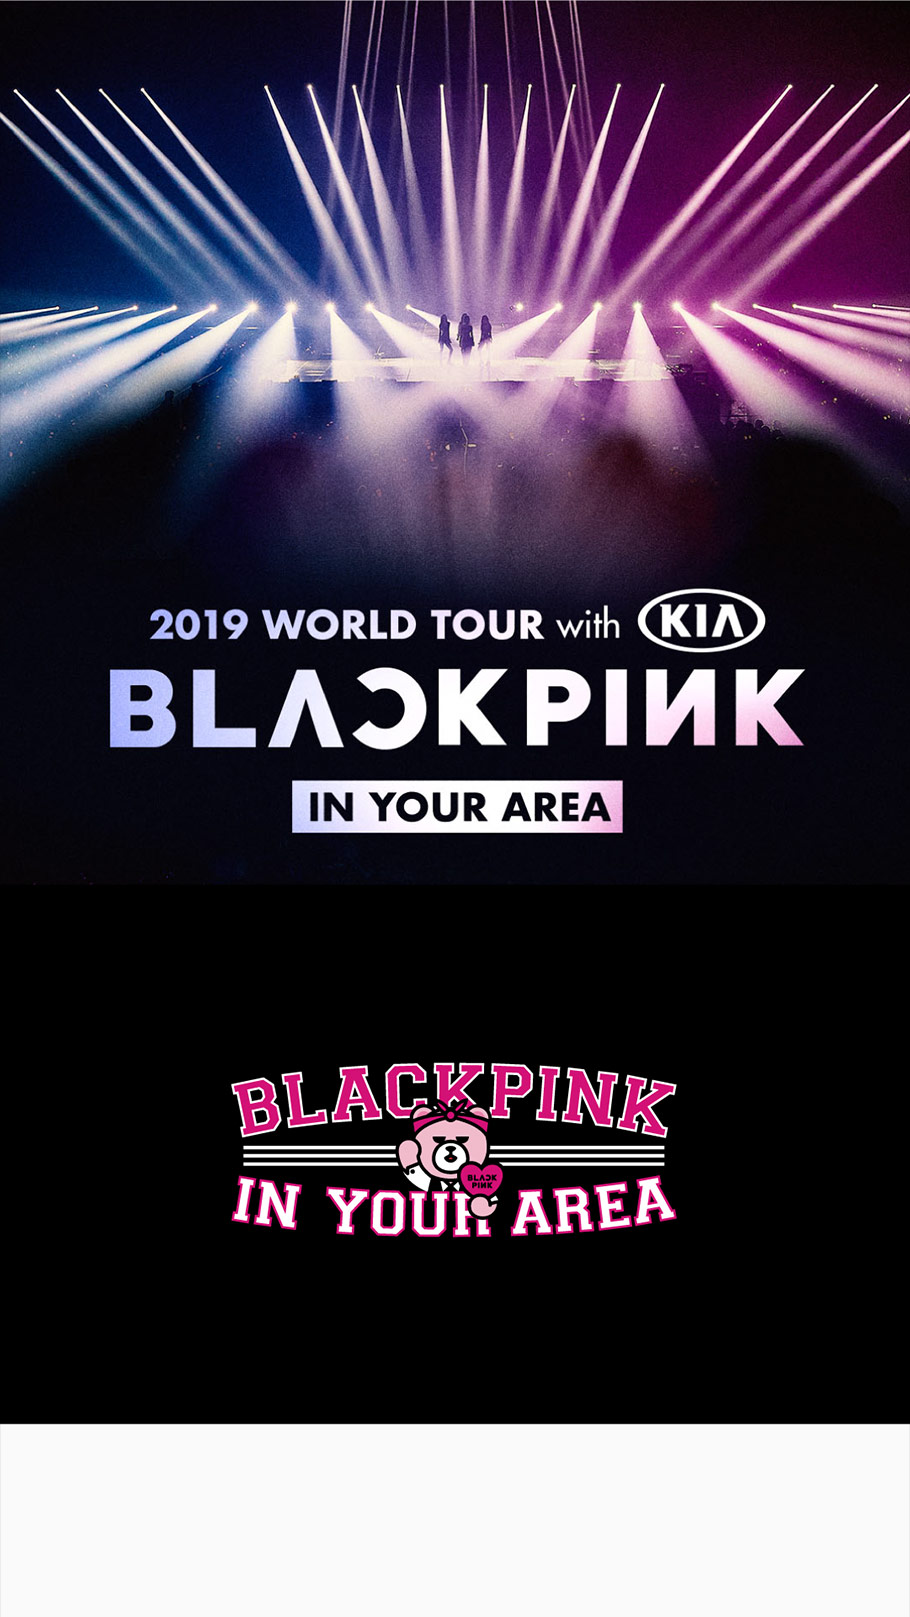 blackpink_worldtour_md